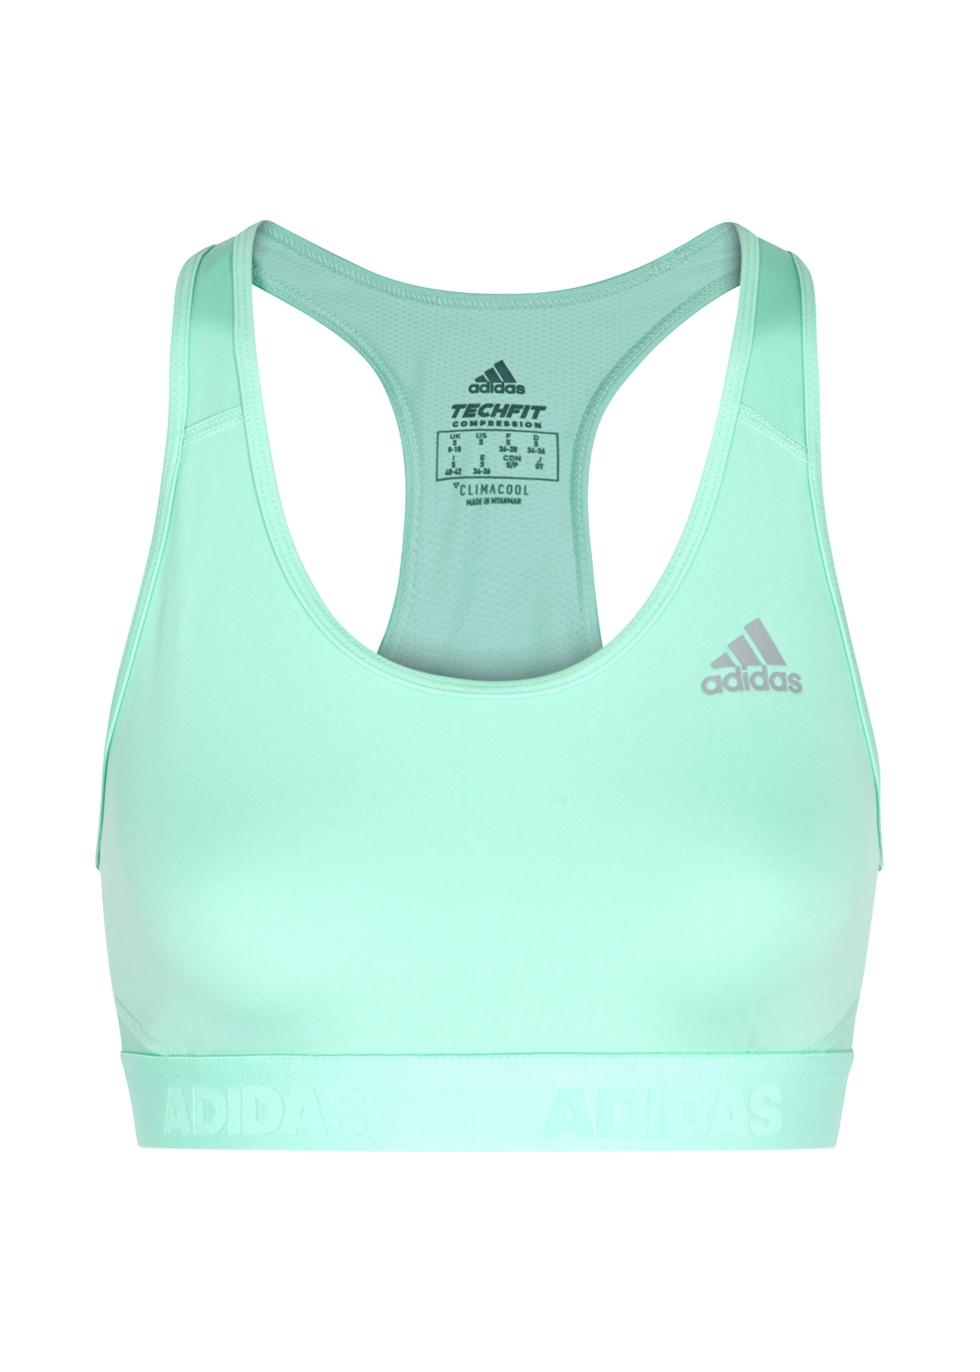 ADIDAS TRAINING Adidas Training Don'T Rest Racerback Jersey Bra Top in Mint